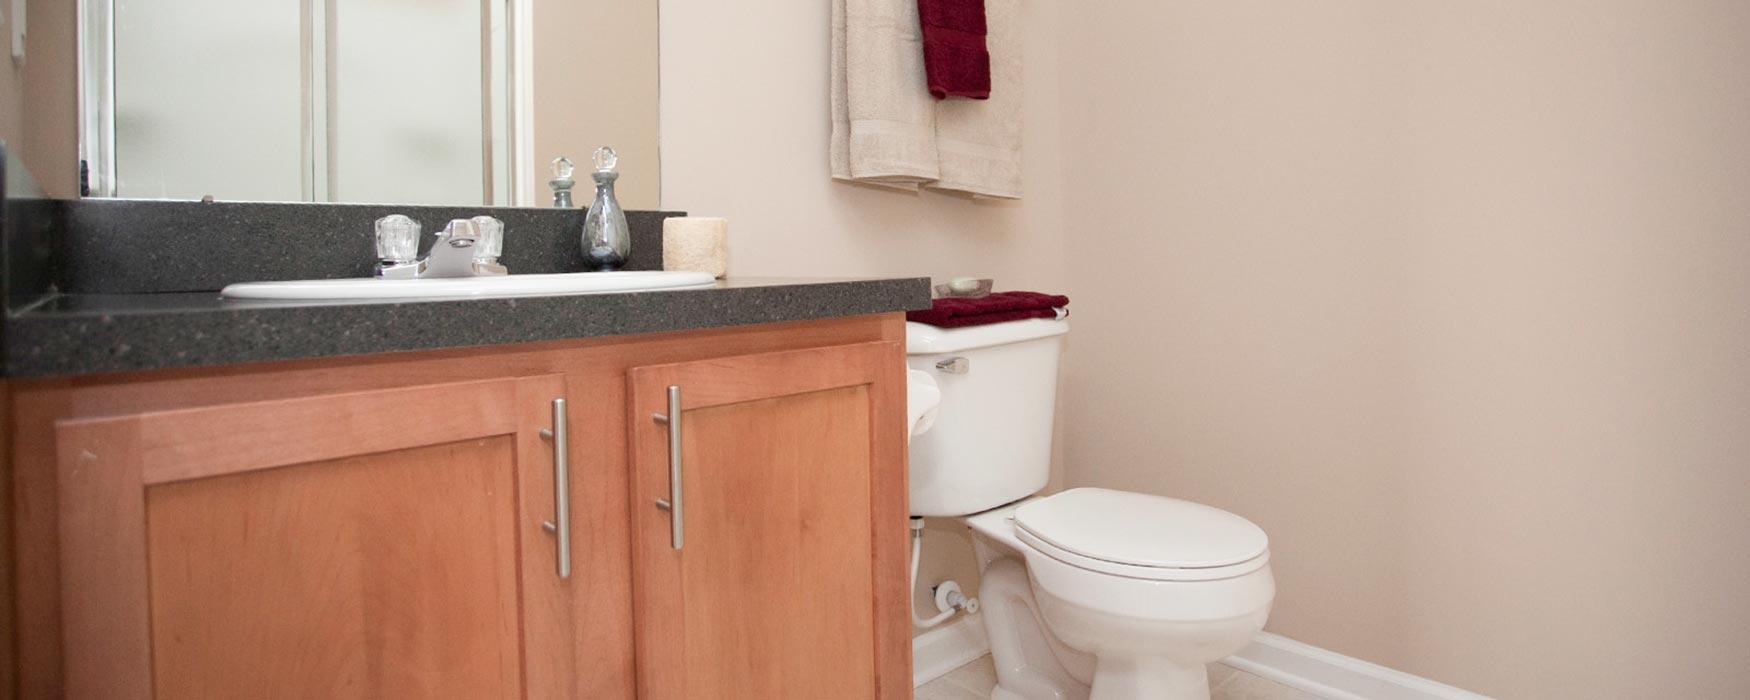 LC Preserve Crossing | Gahanna Apartments | Bentley Flat Bathroom